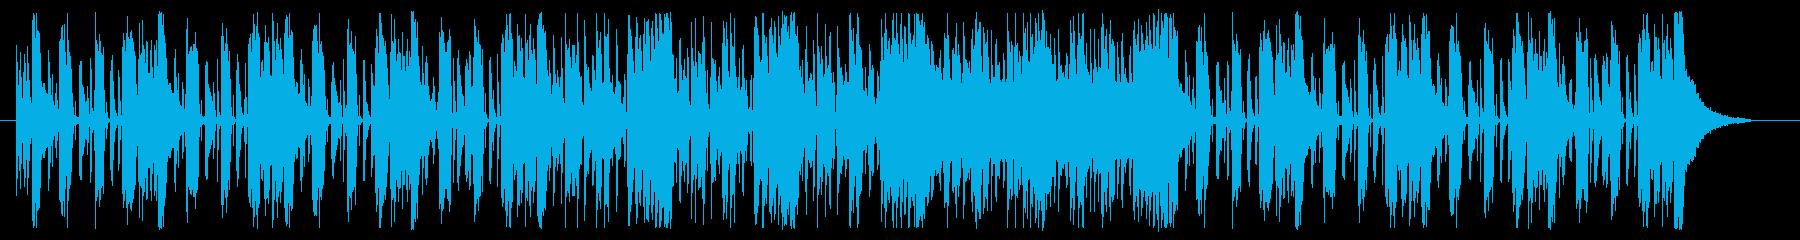 ROCKバンド_シンプルギターリフ楽曲の再生済みの波形